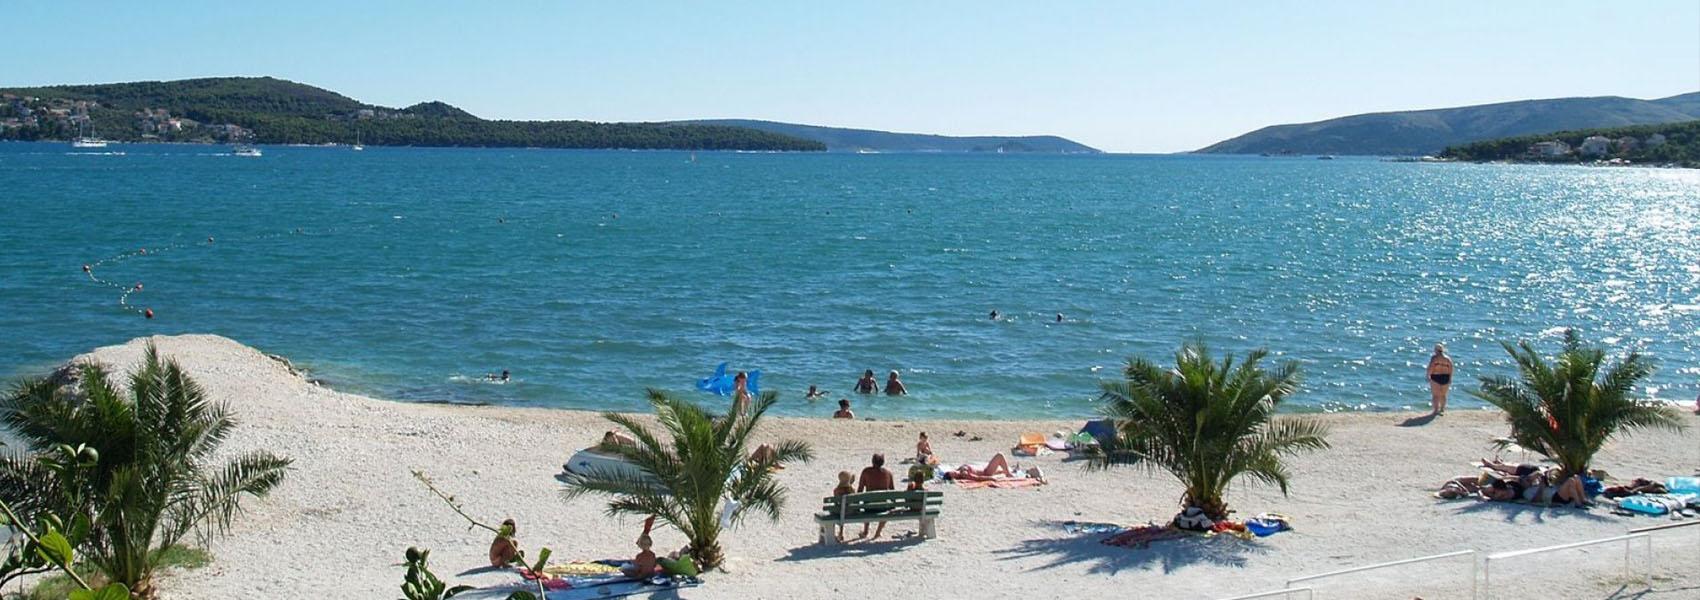 Beaches in Trogir area | Plavi Horizont